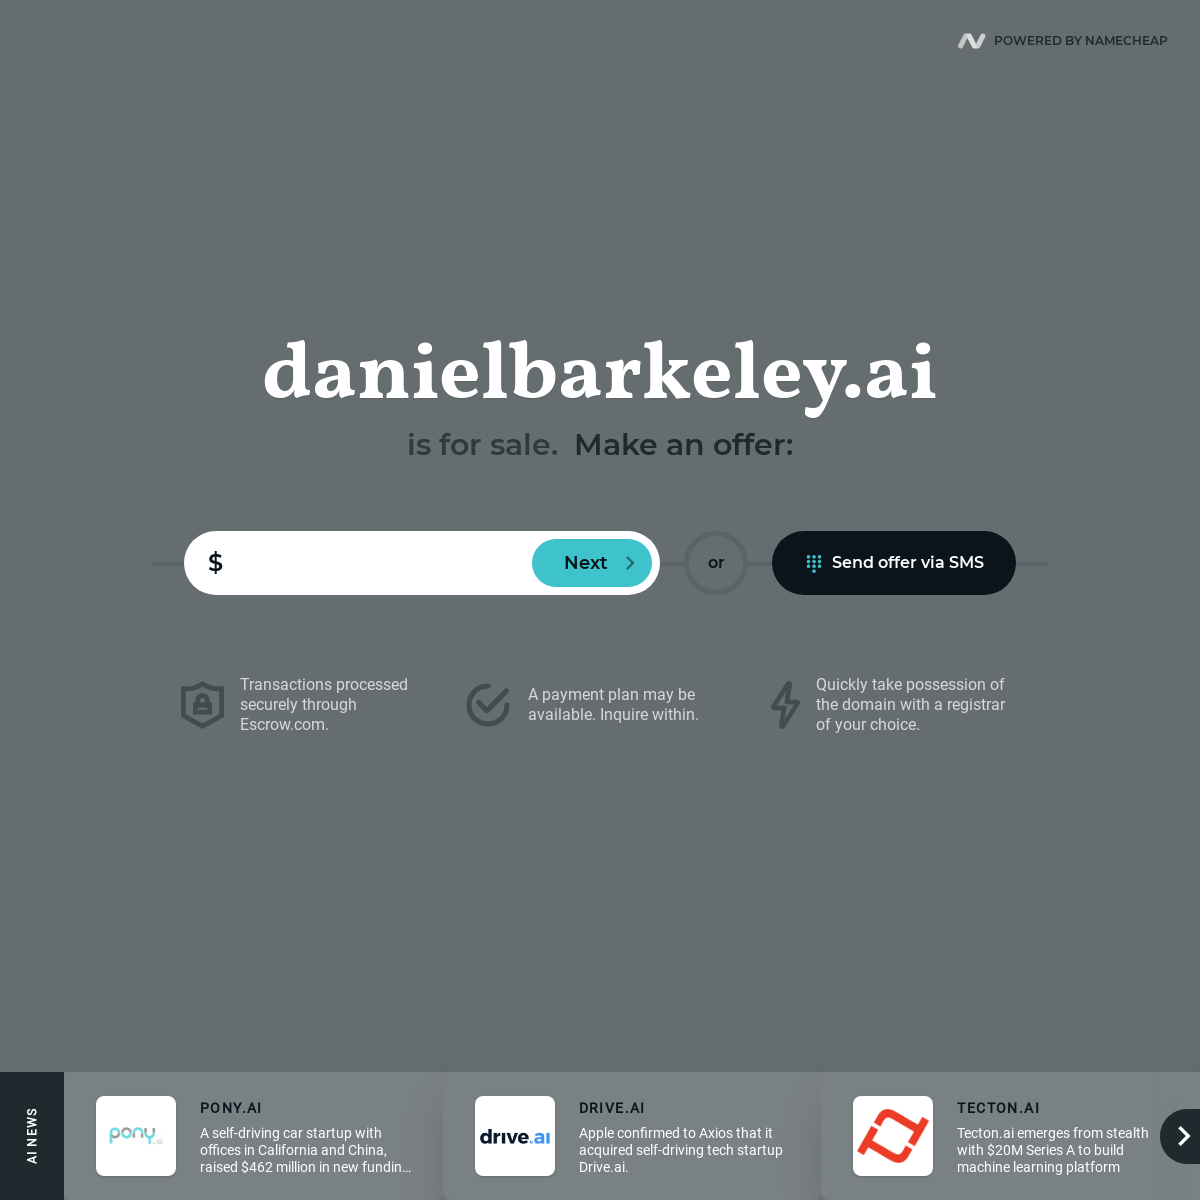 danielbarkeley.ai is for sale